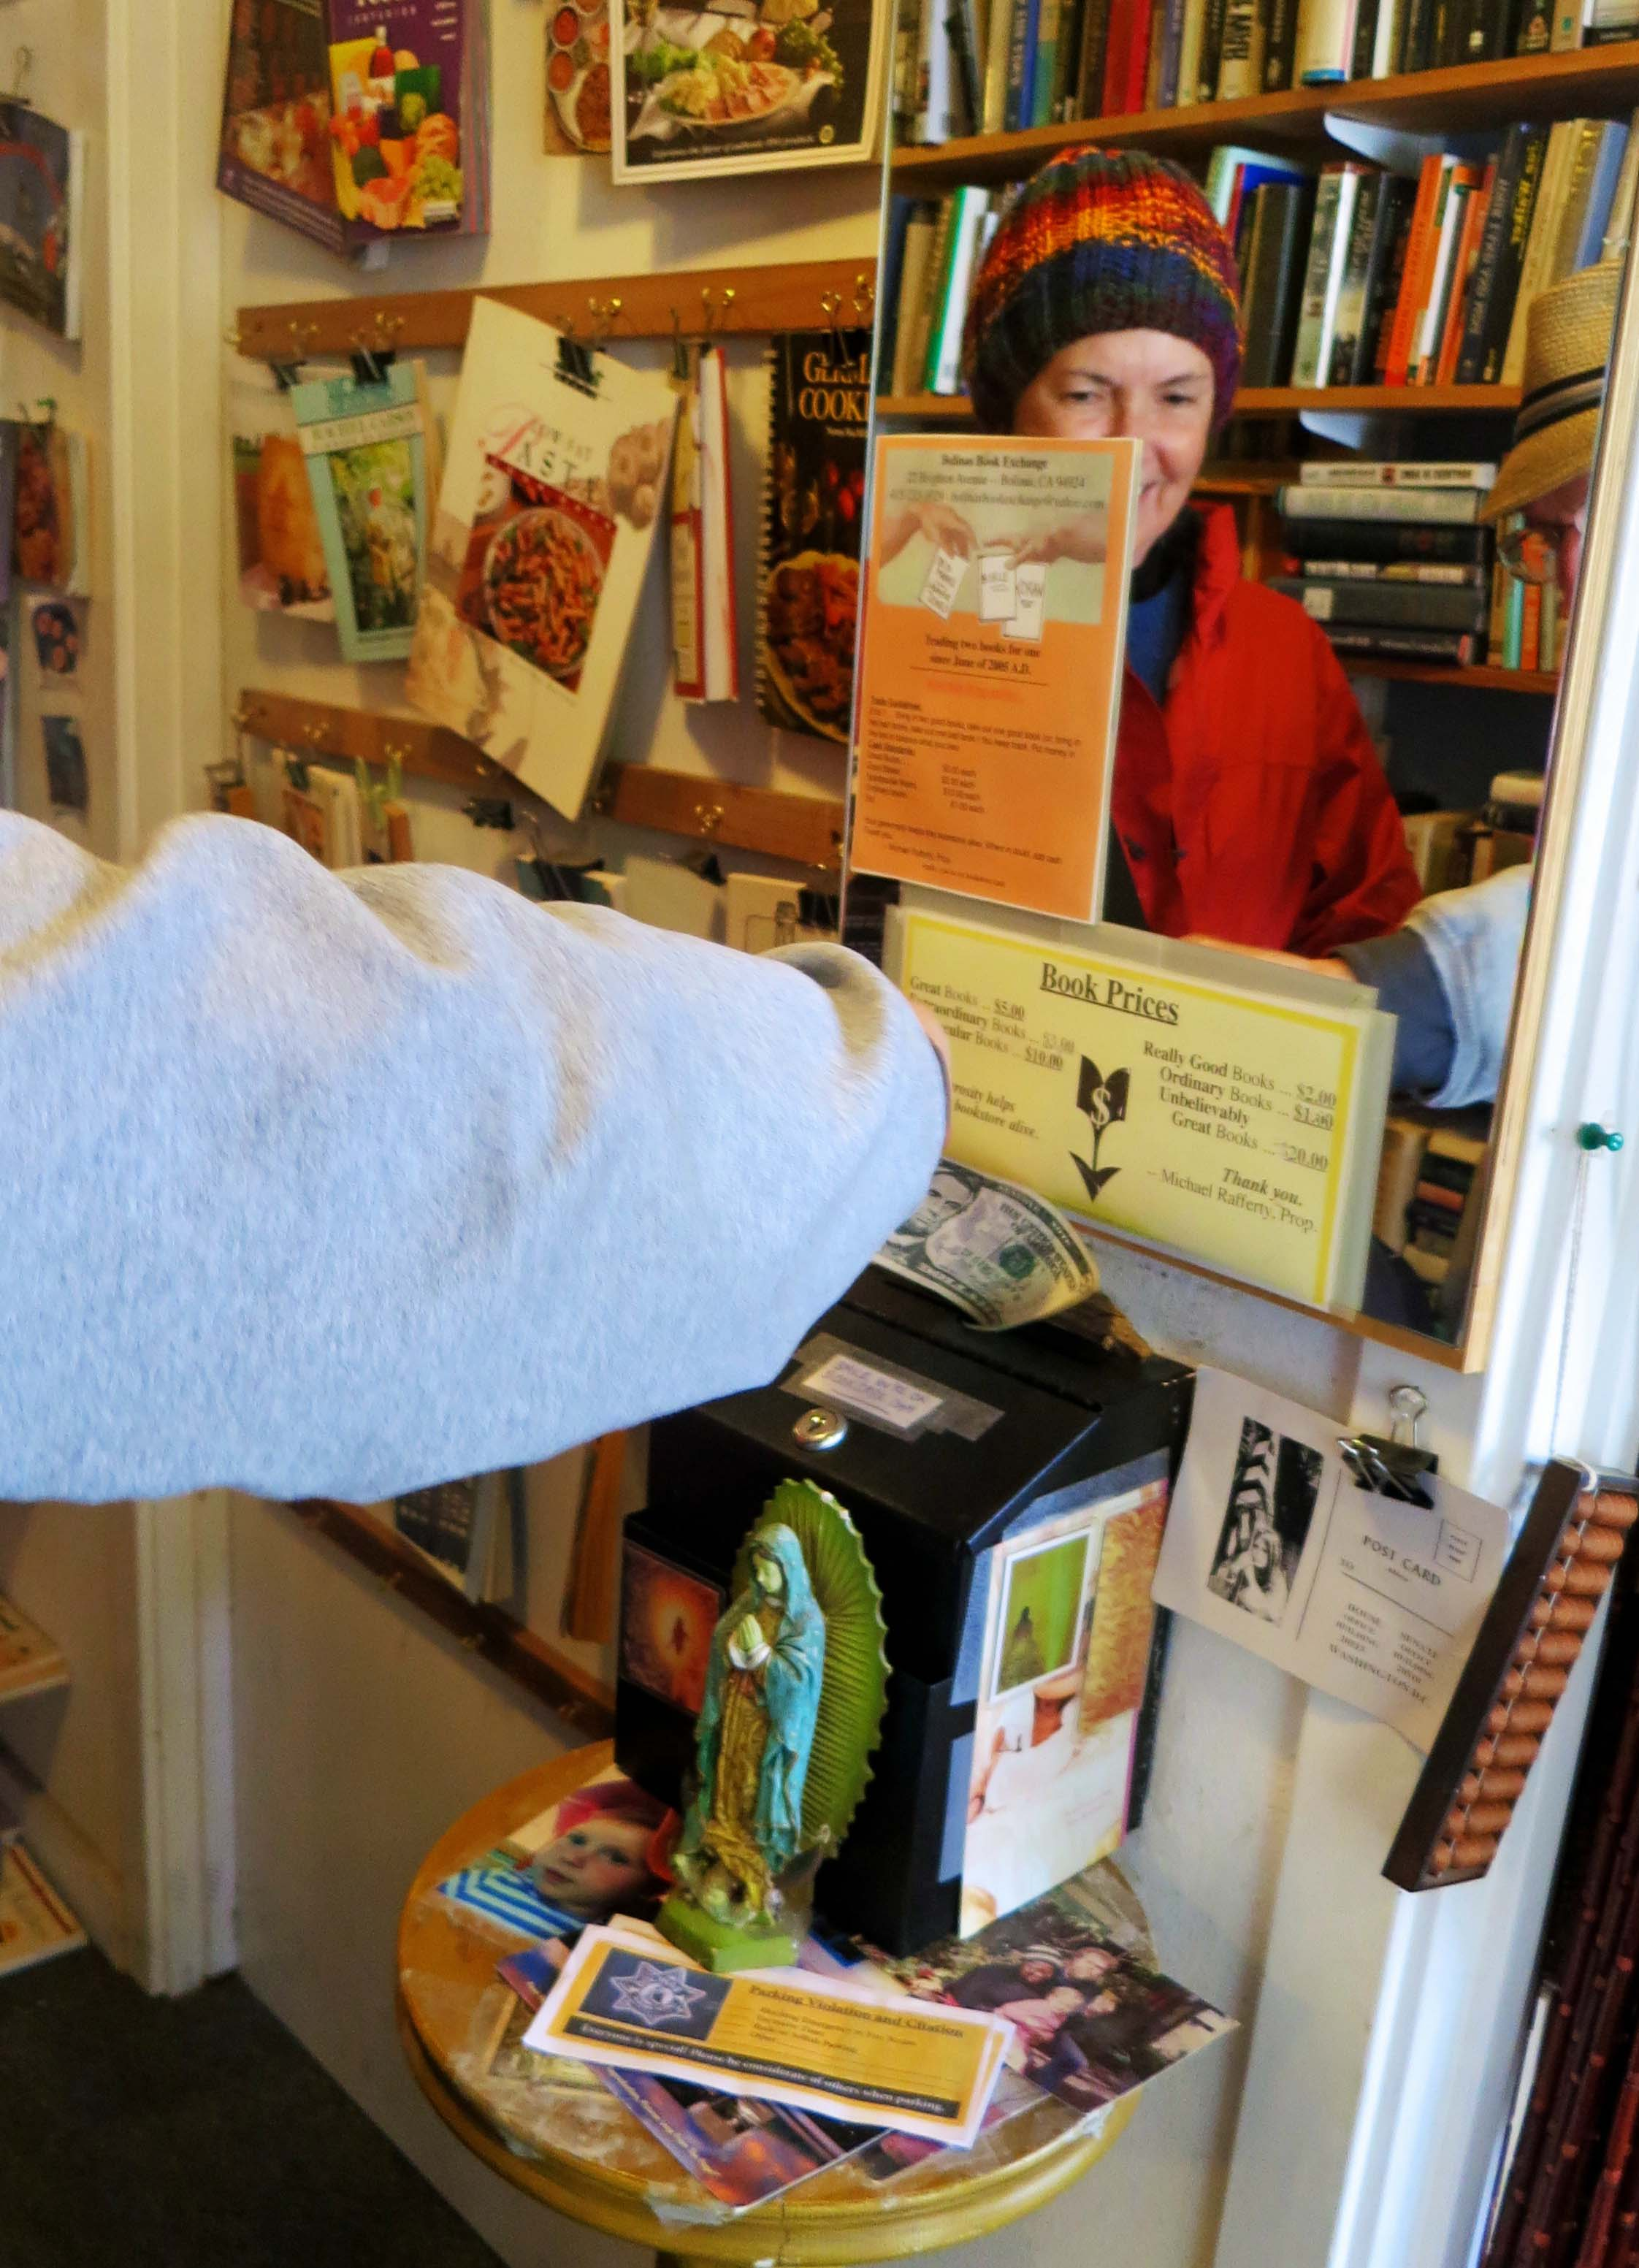 Bolinas Book Store photo by Curtis Mekemson.